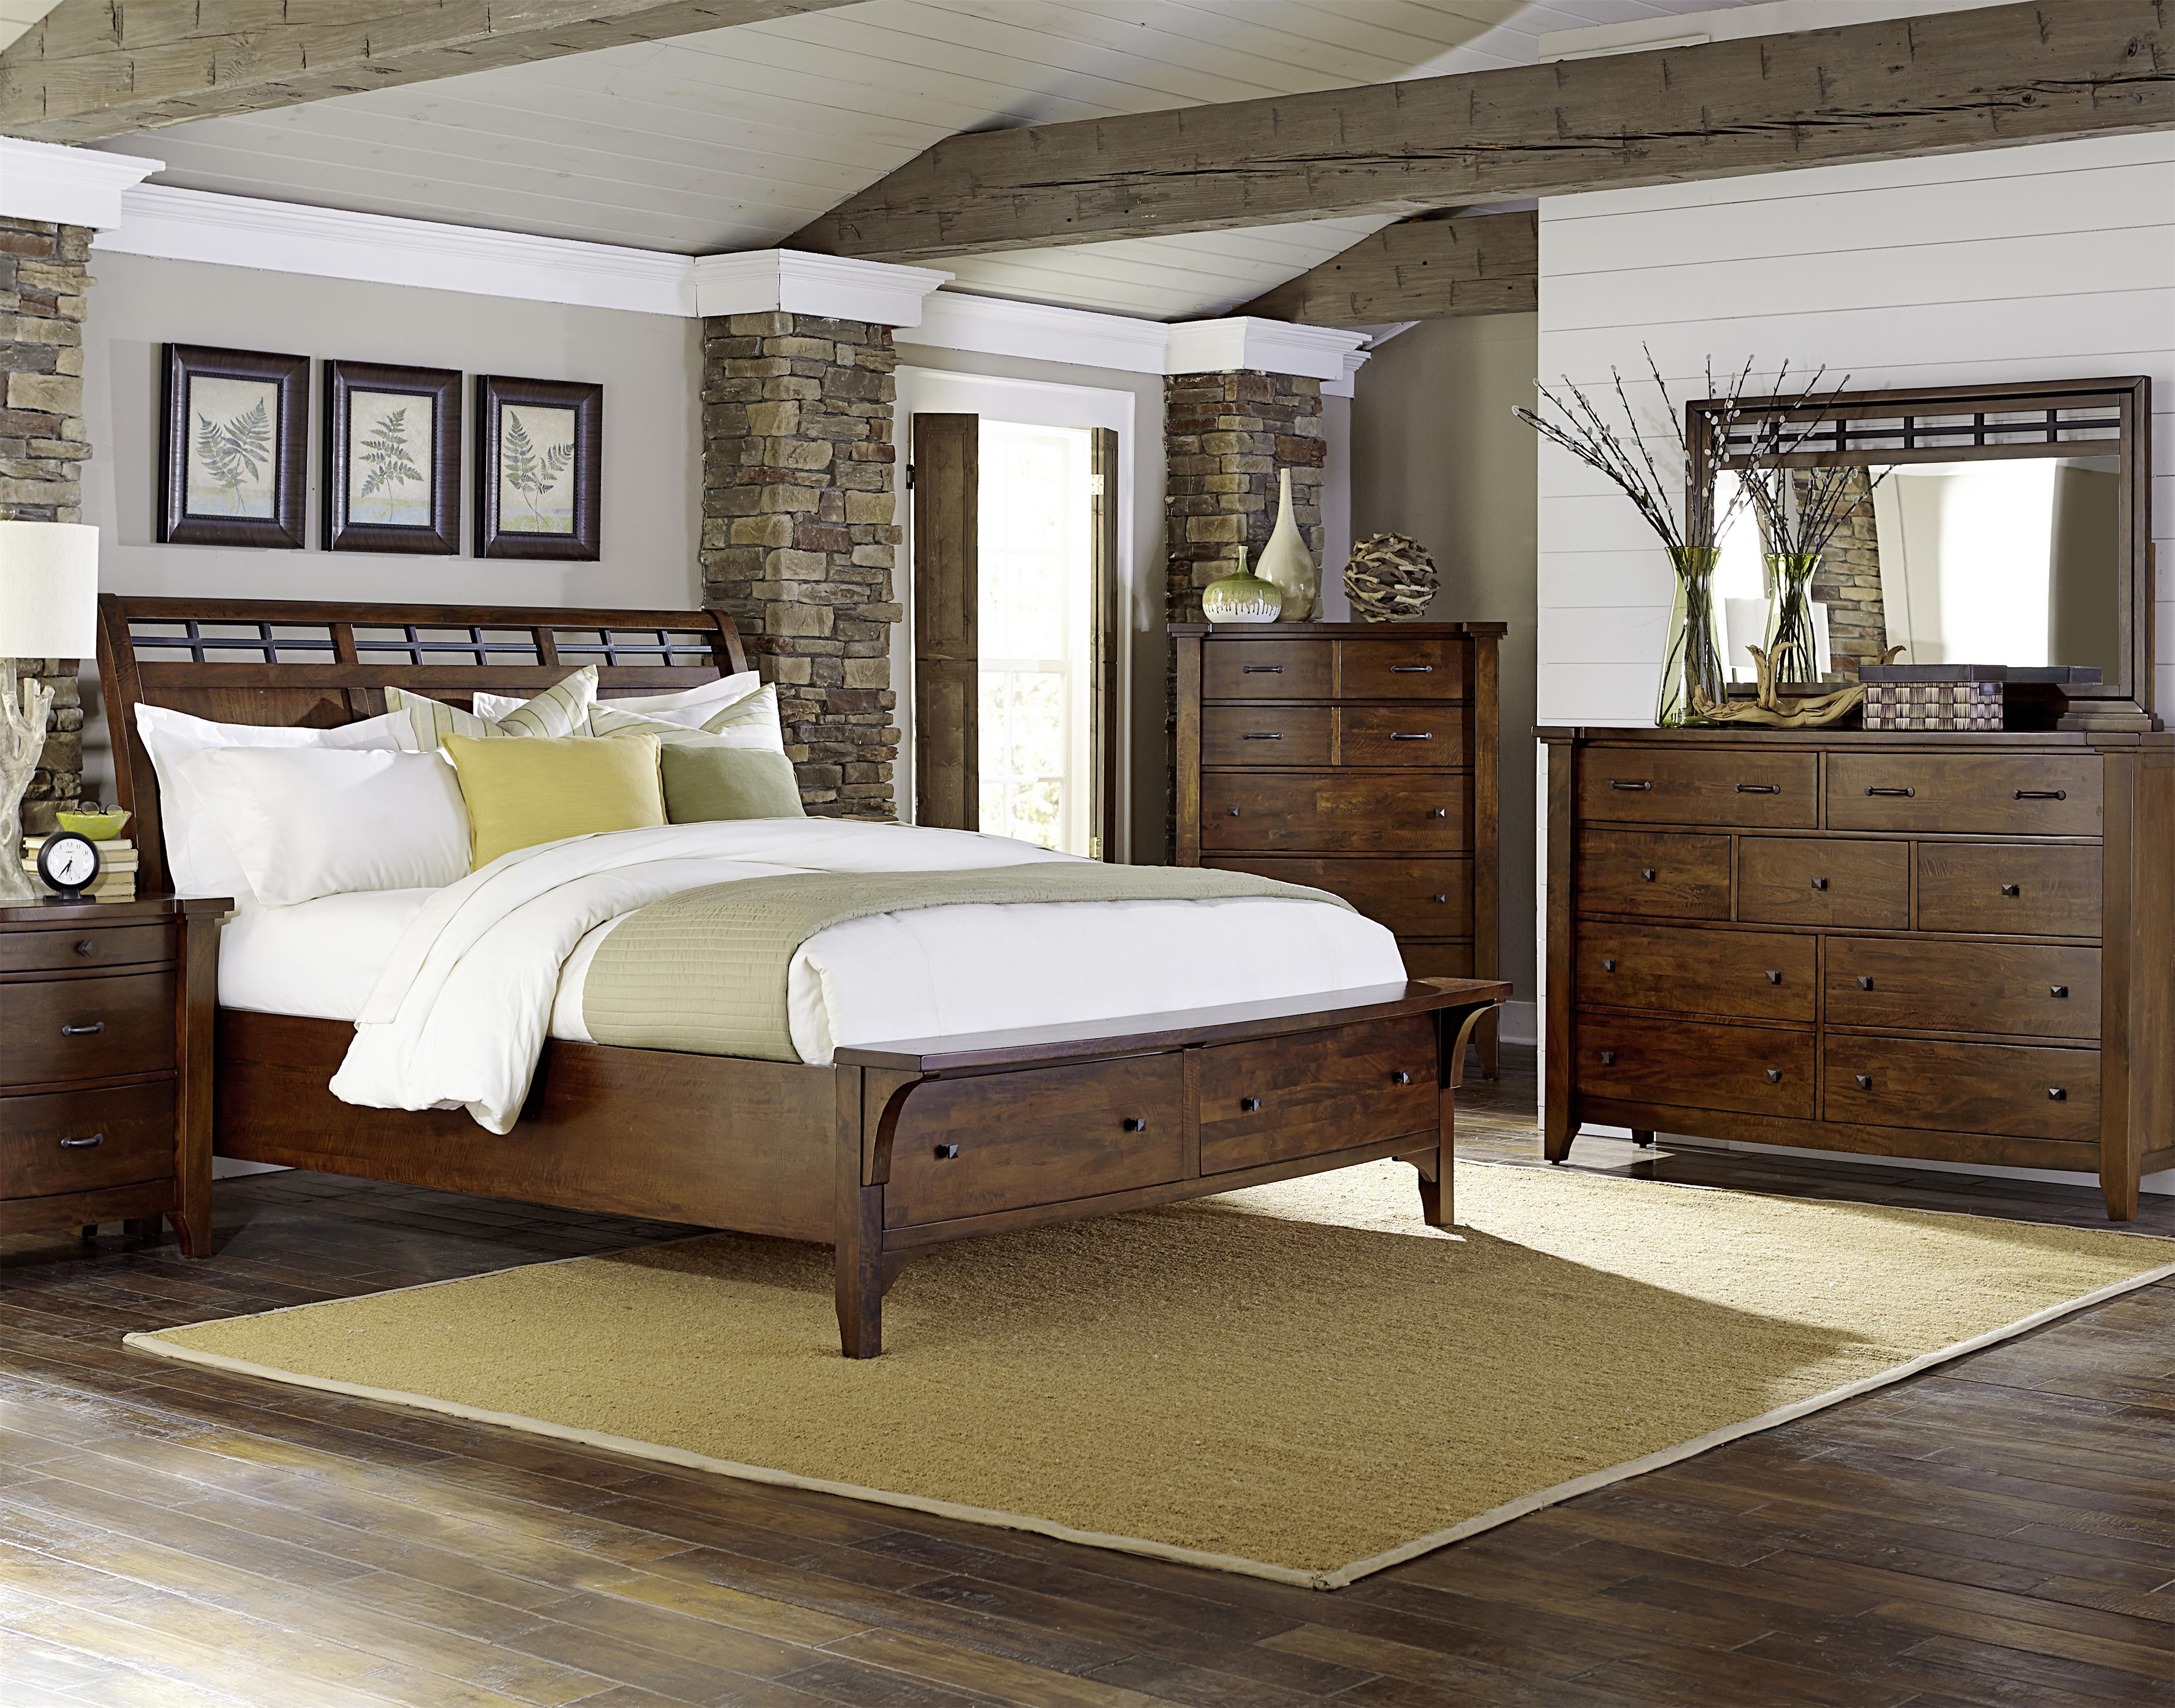 Napa furniture designs whistler retreat king bedroom group darvin furniture bedroom groups for Napa valley bedroom furniture